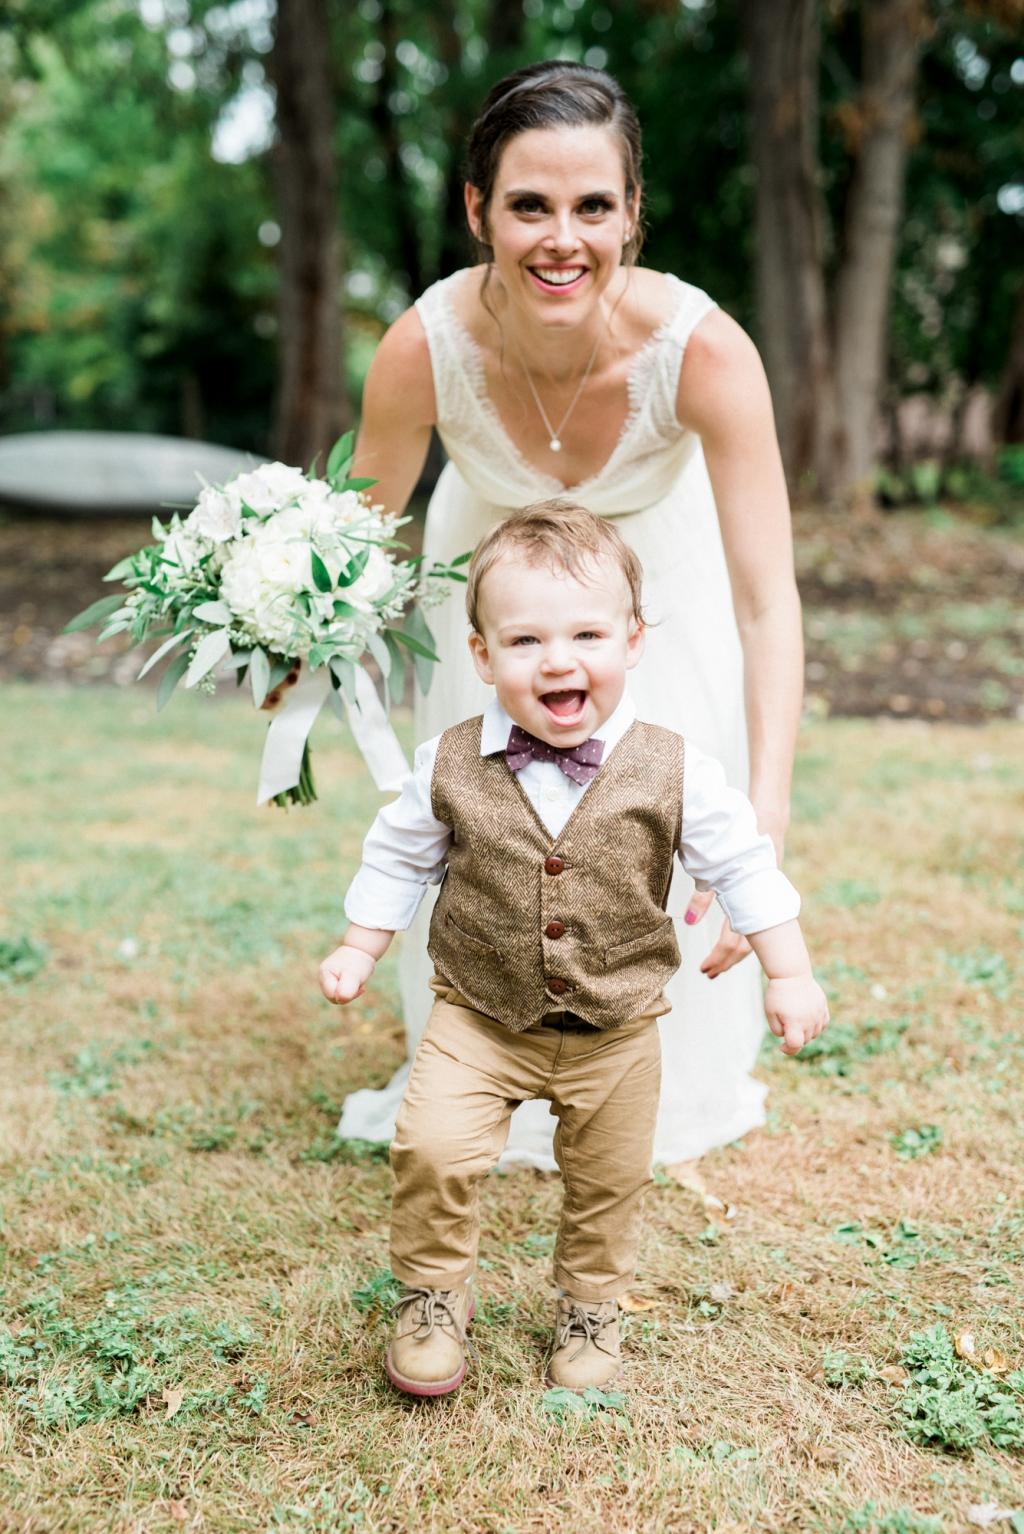 haley-richter-photography-new-jersey-backyard-wedding-097